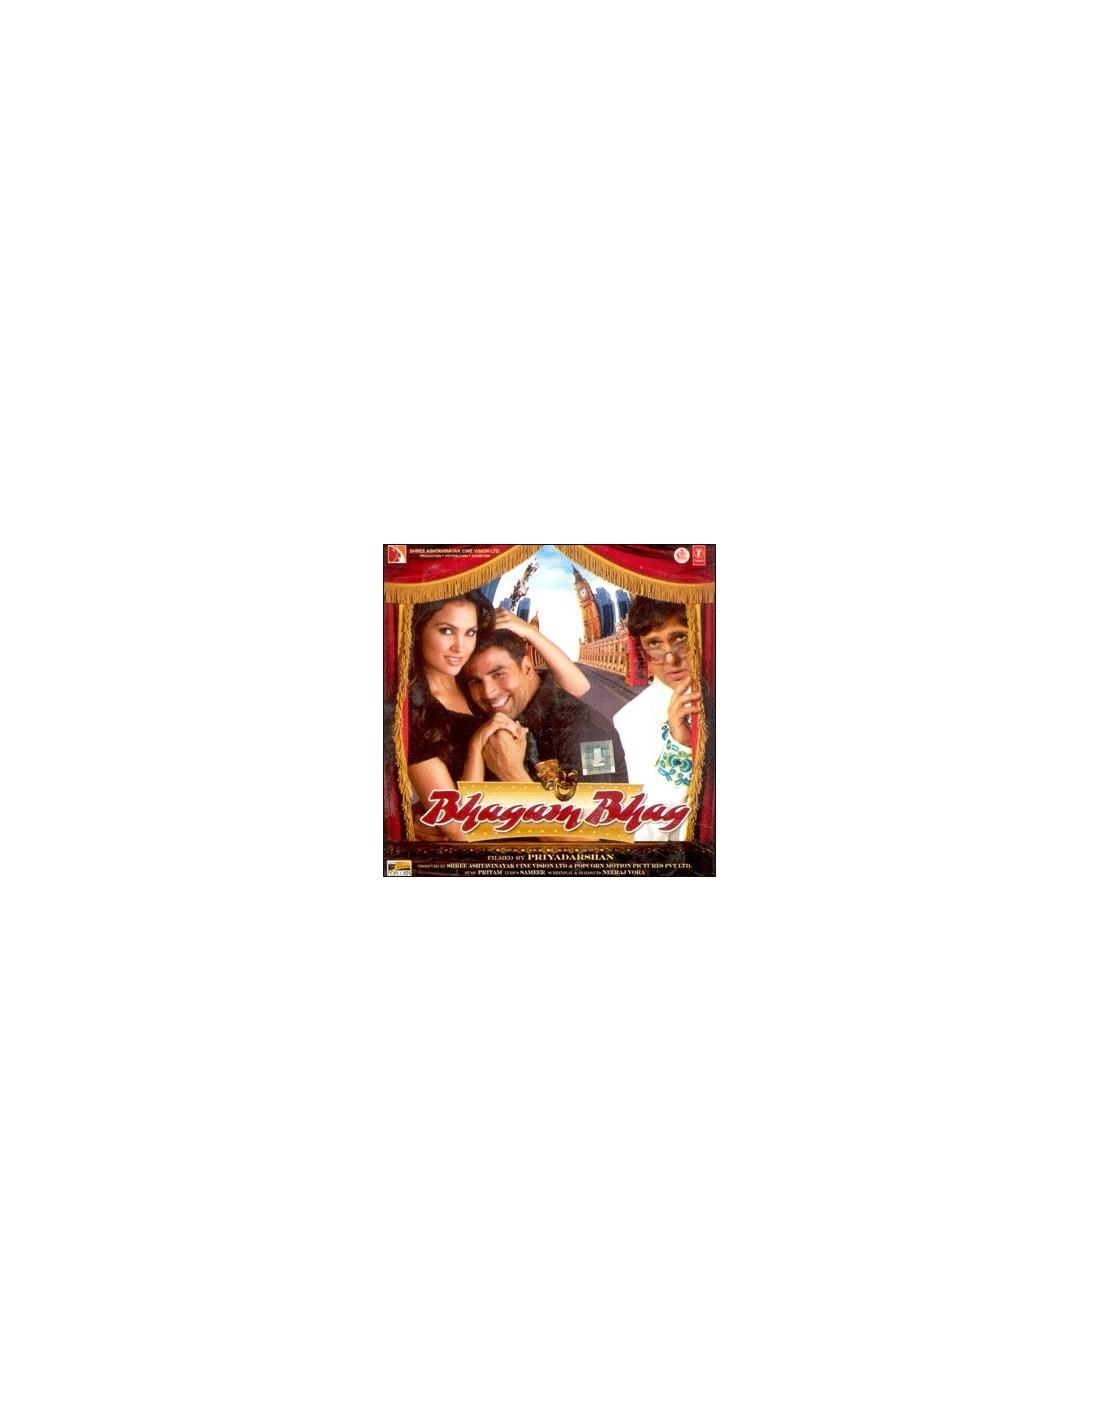 Rudramadevi allu arjun téléchargement du film hindi dubbed.